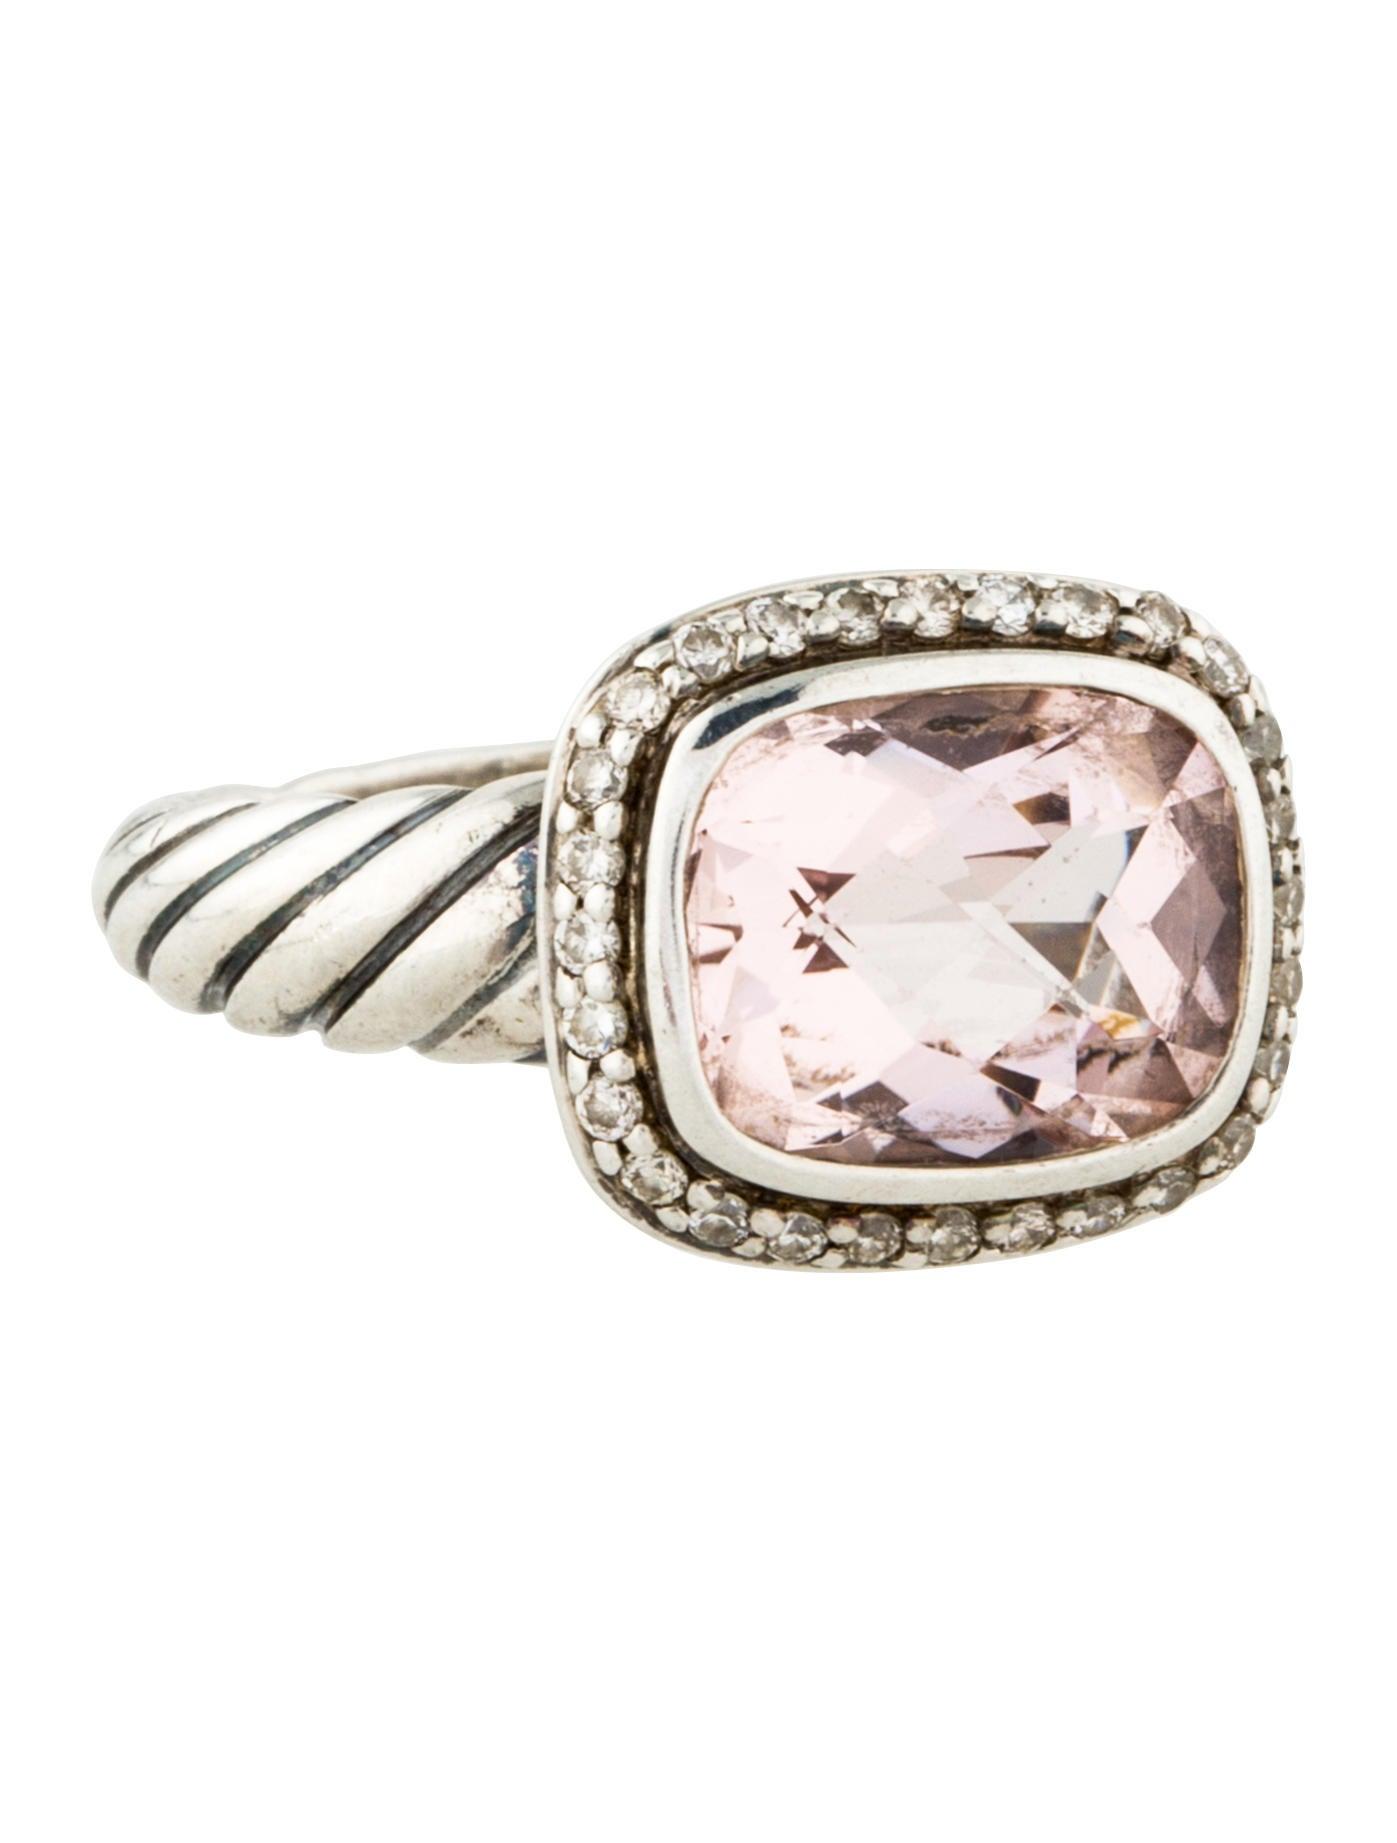 David yurman diamond morganite noblesse ring rings for David yurman inspired jewelry rings